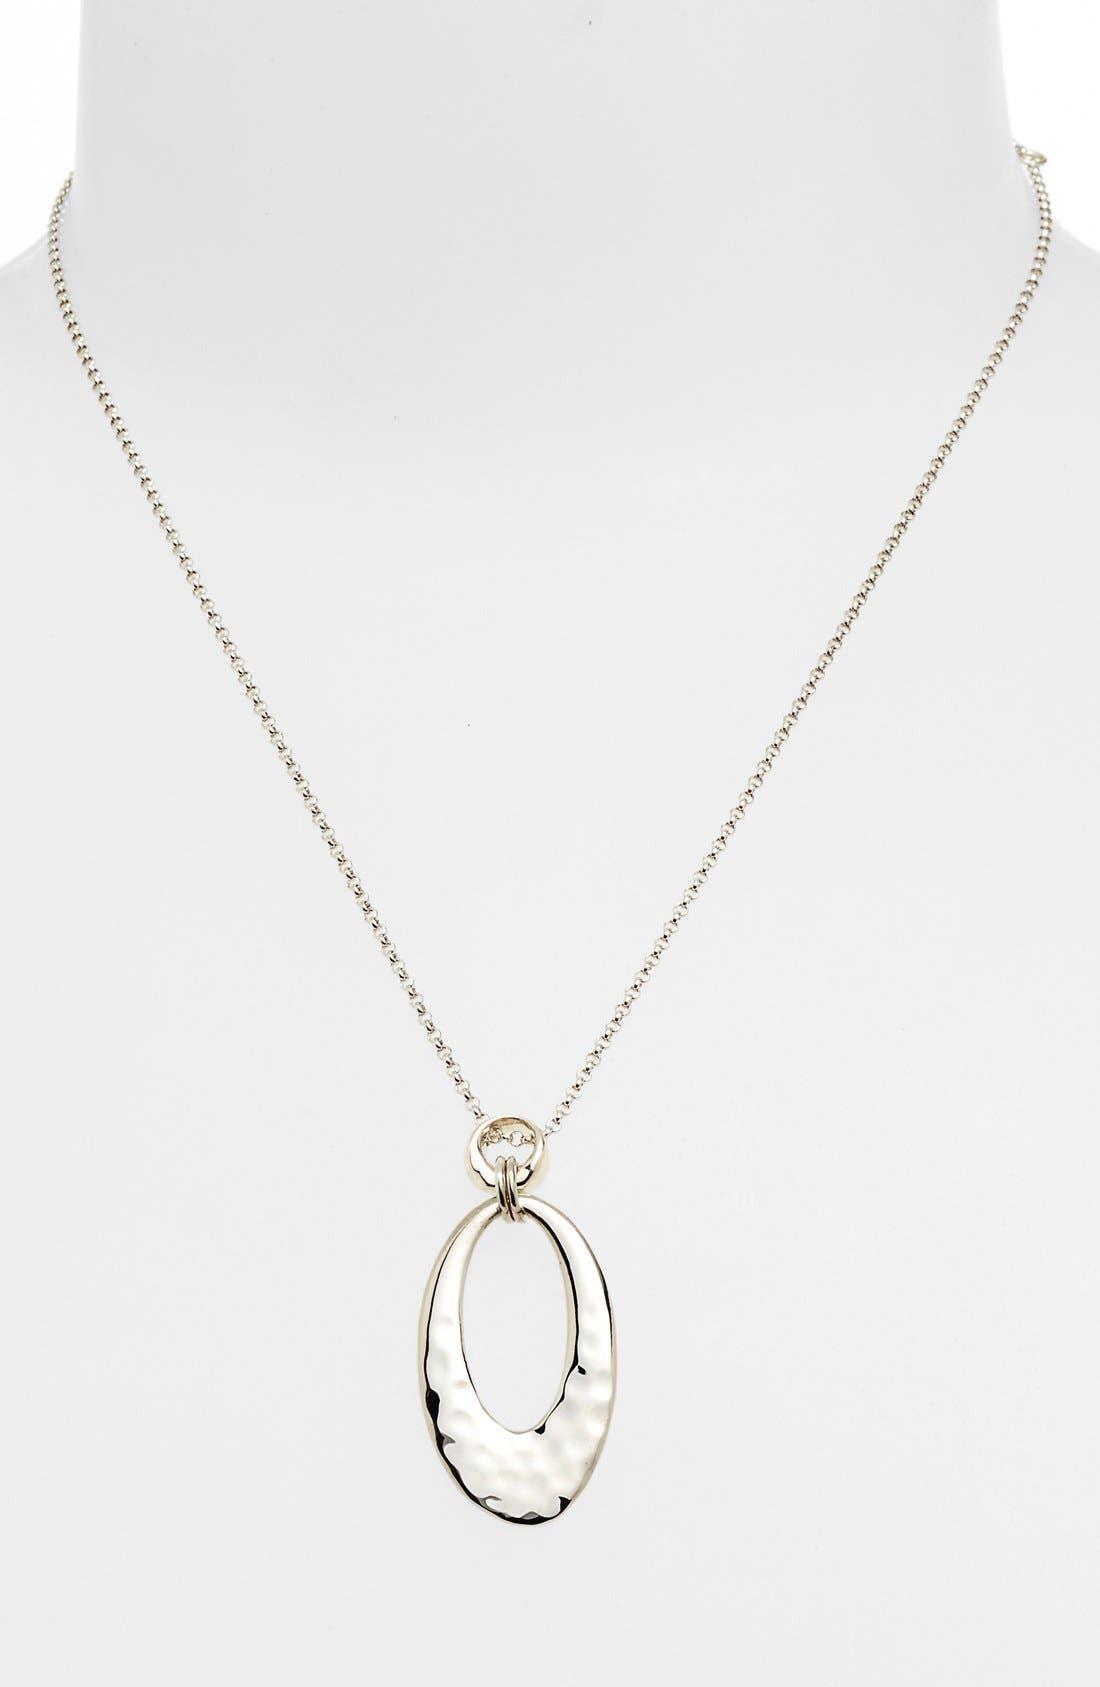 Alternate Image 1 Selected - Judith Jack 'Oahu' Hammered Oval Pendant Necklace